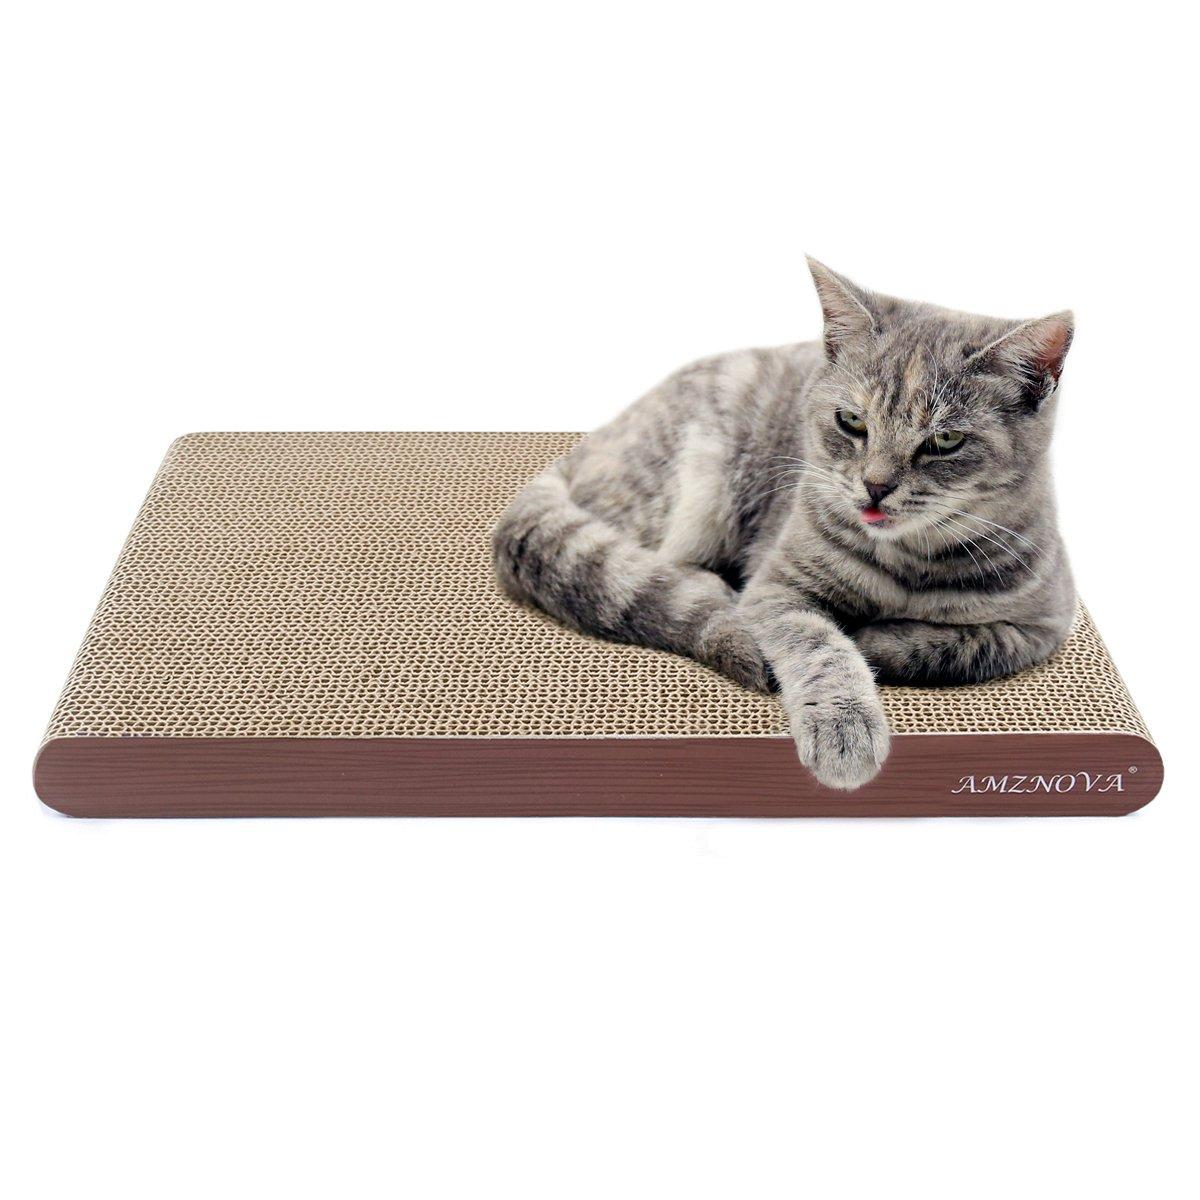 AMZNOVA Cat Scratcher Cardboard Scratching Pads Scratch Lounge Sofa Bed, Wide, Wood Floor Print, 1 Pack